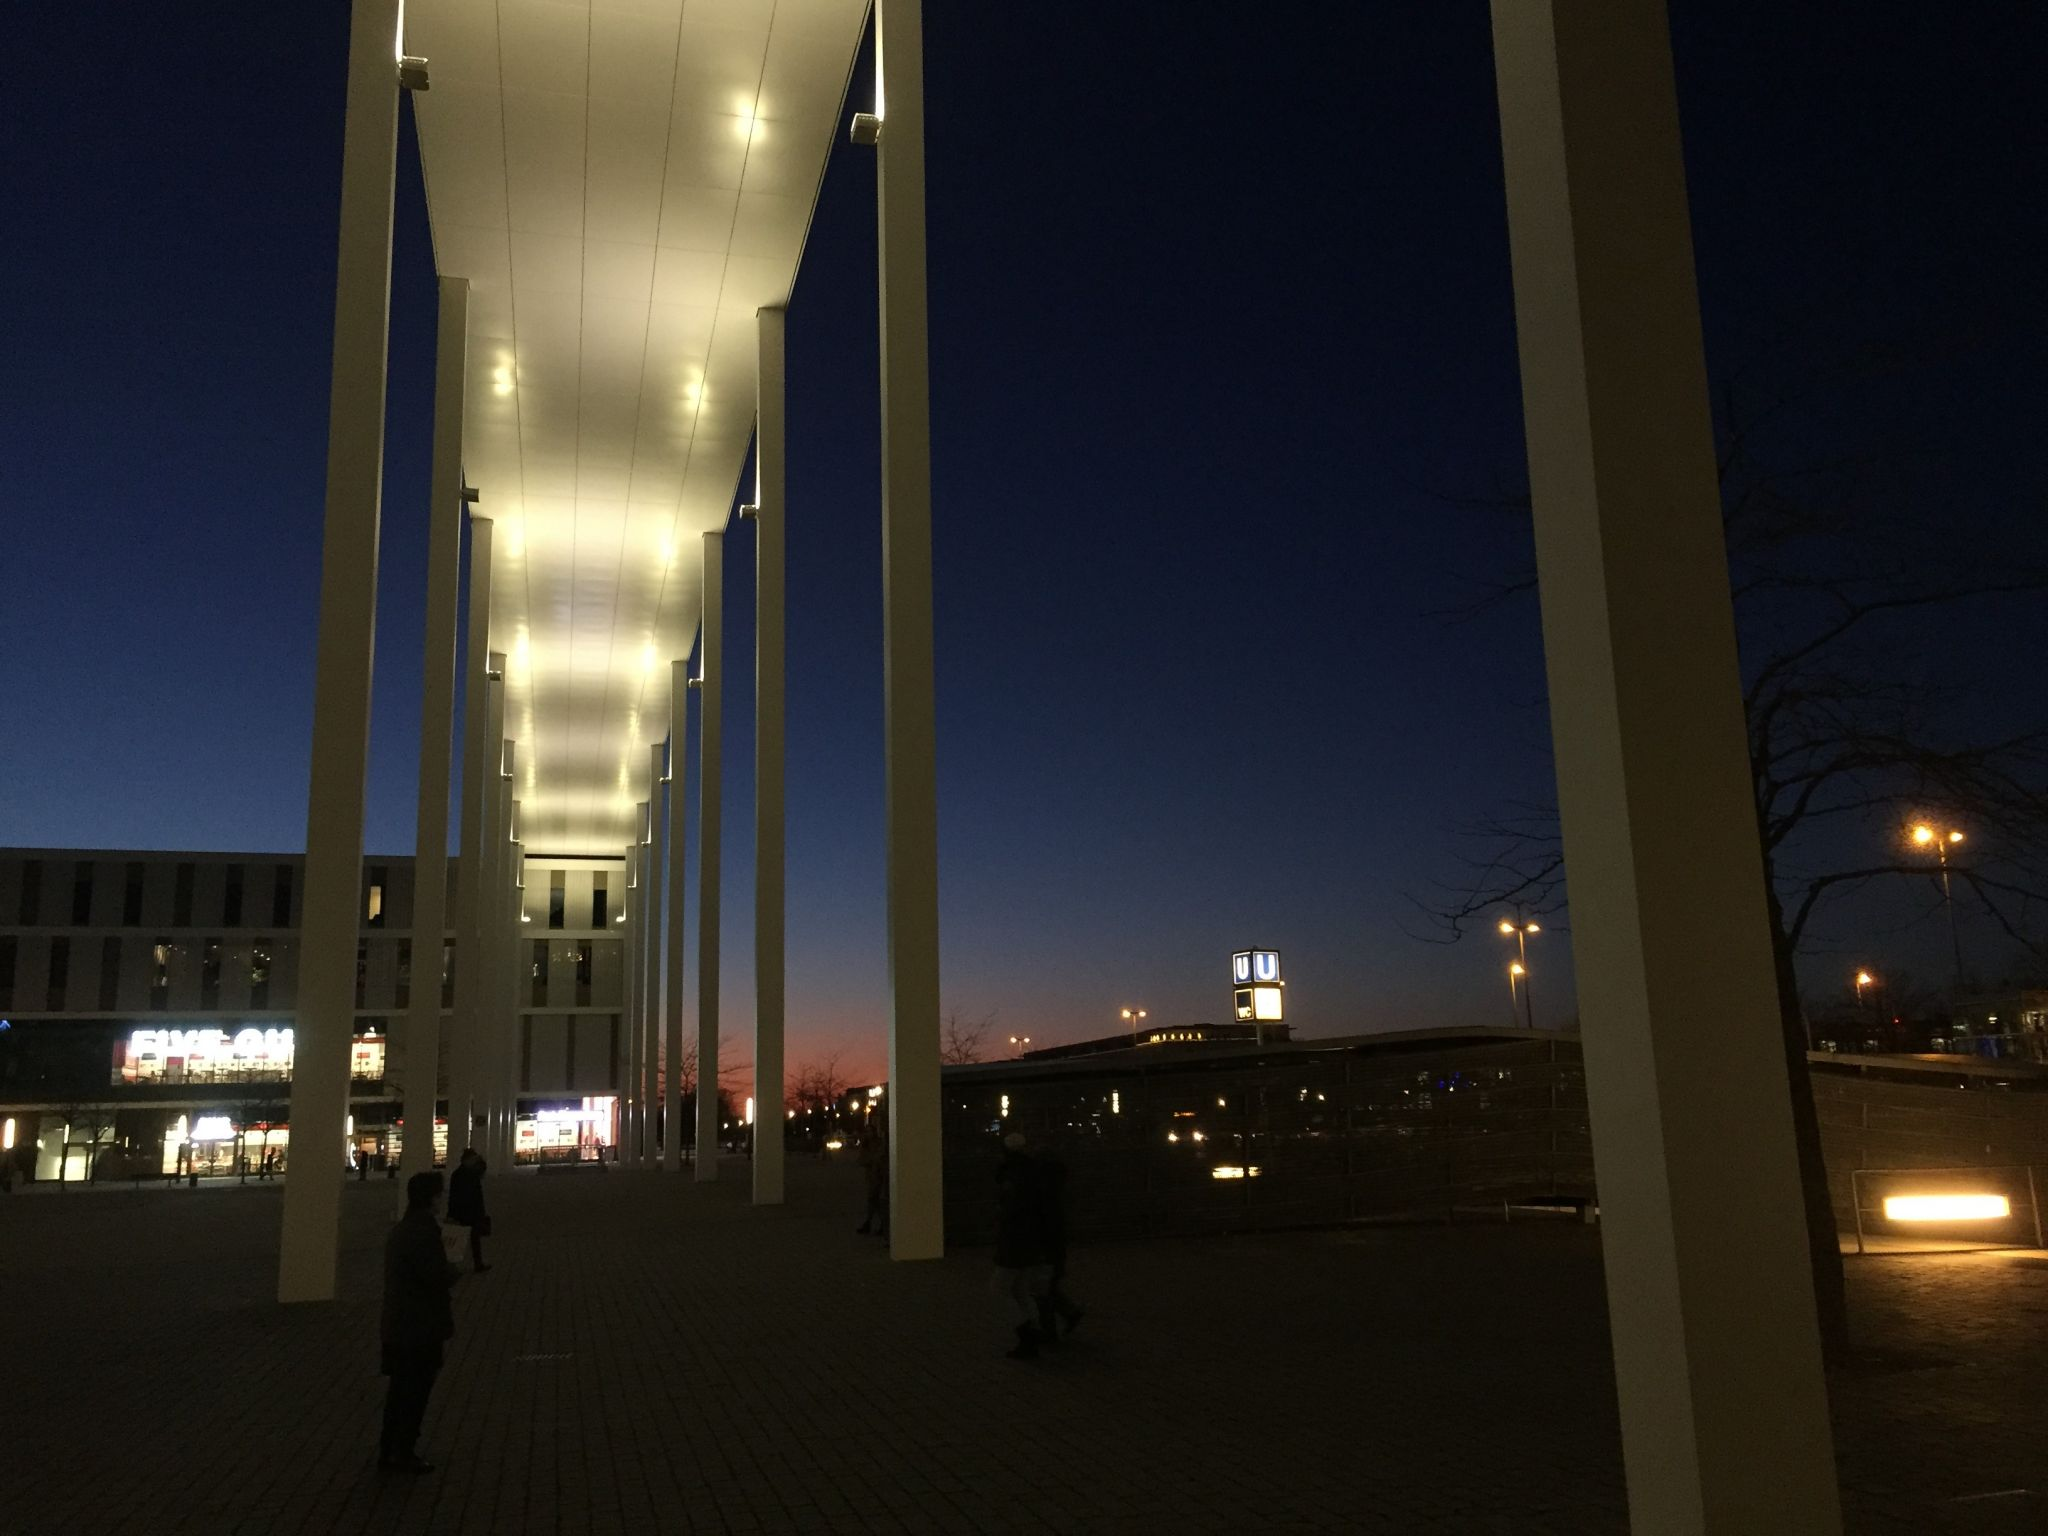 Portikus - Willy-Brandt Platz, München, Germany